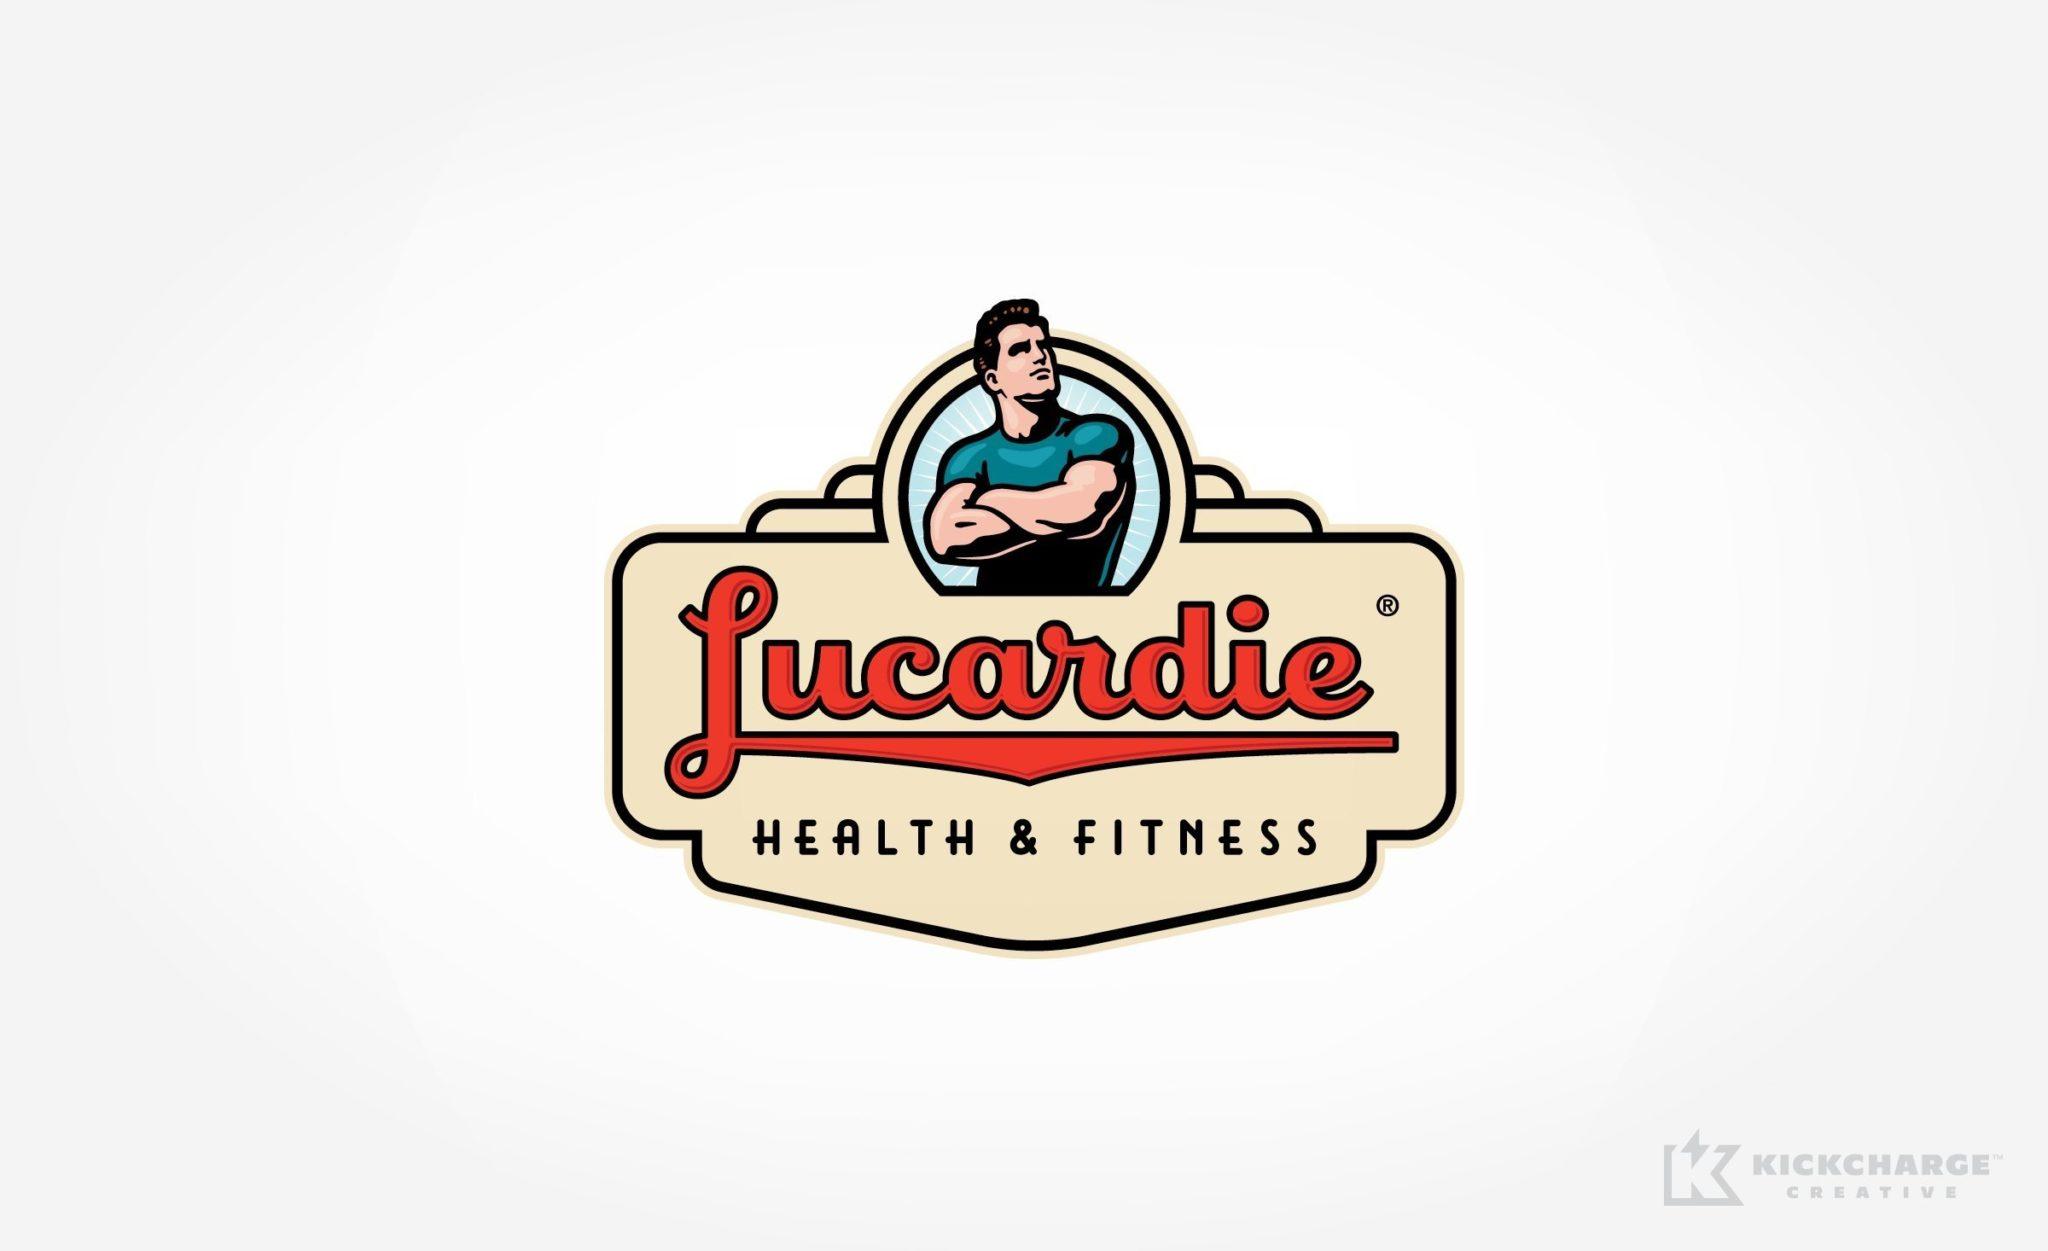 Logo design for Lucardie Health & Fitness.